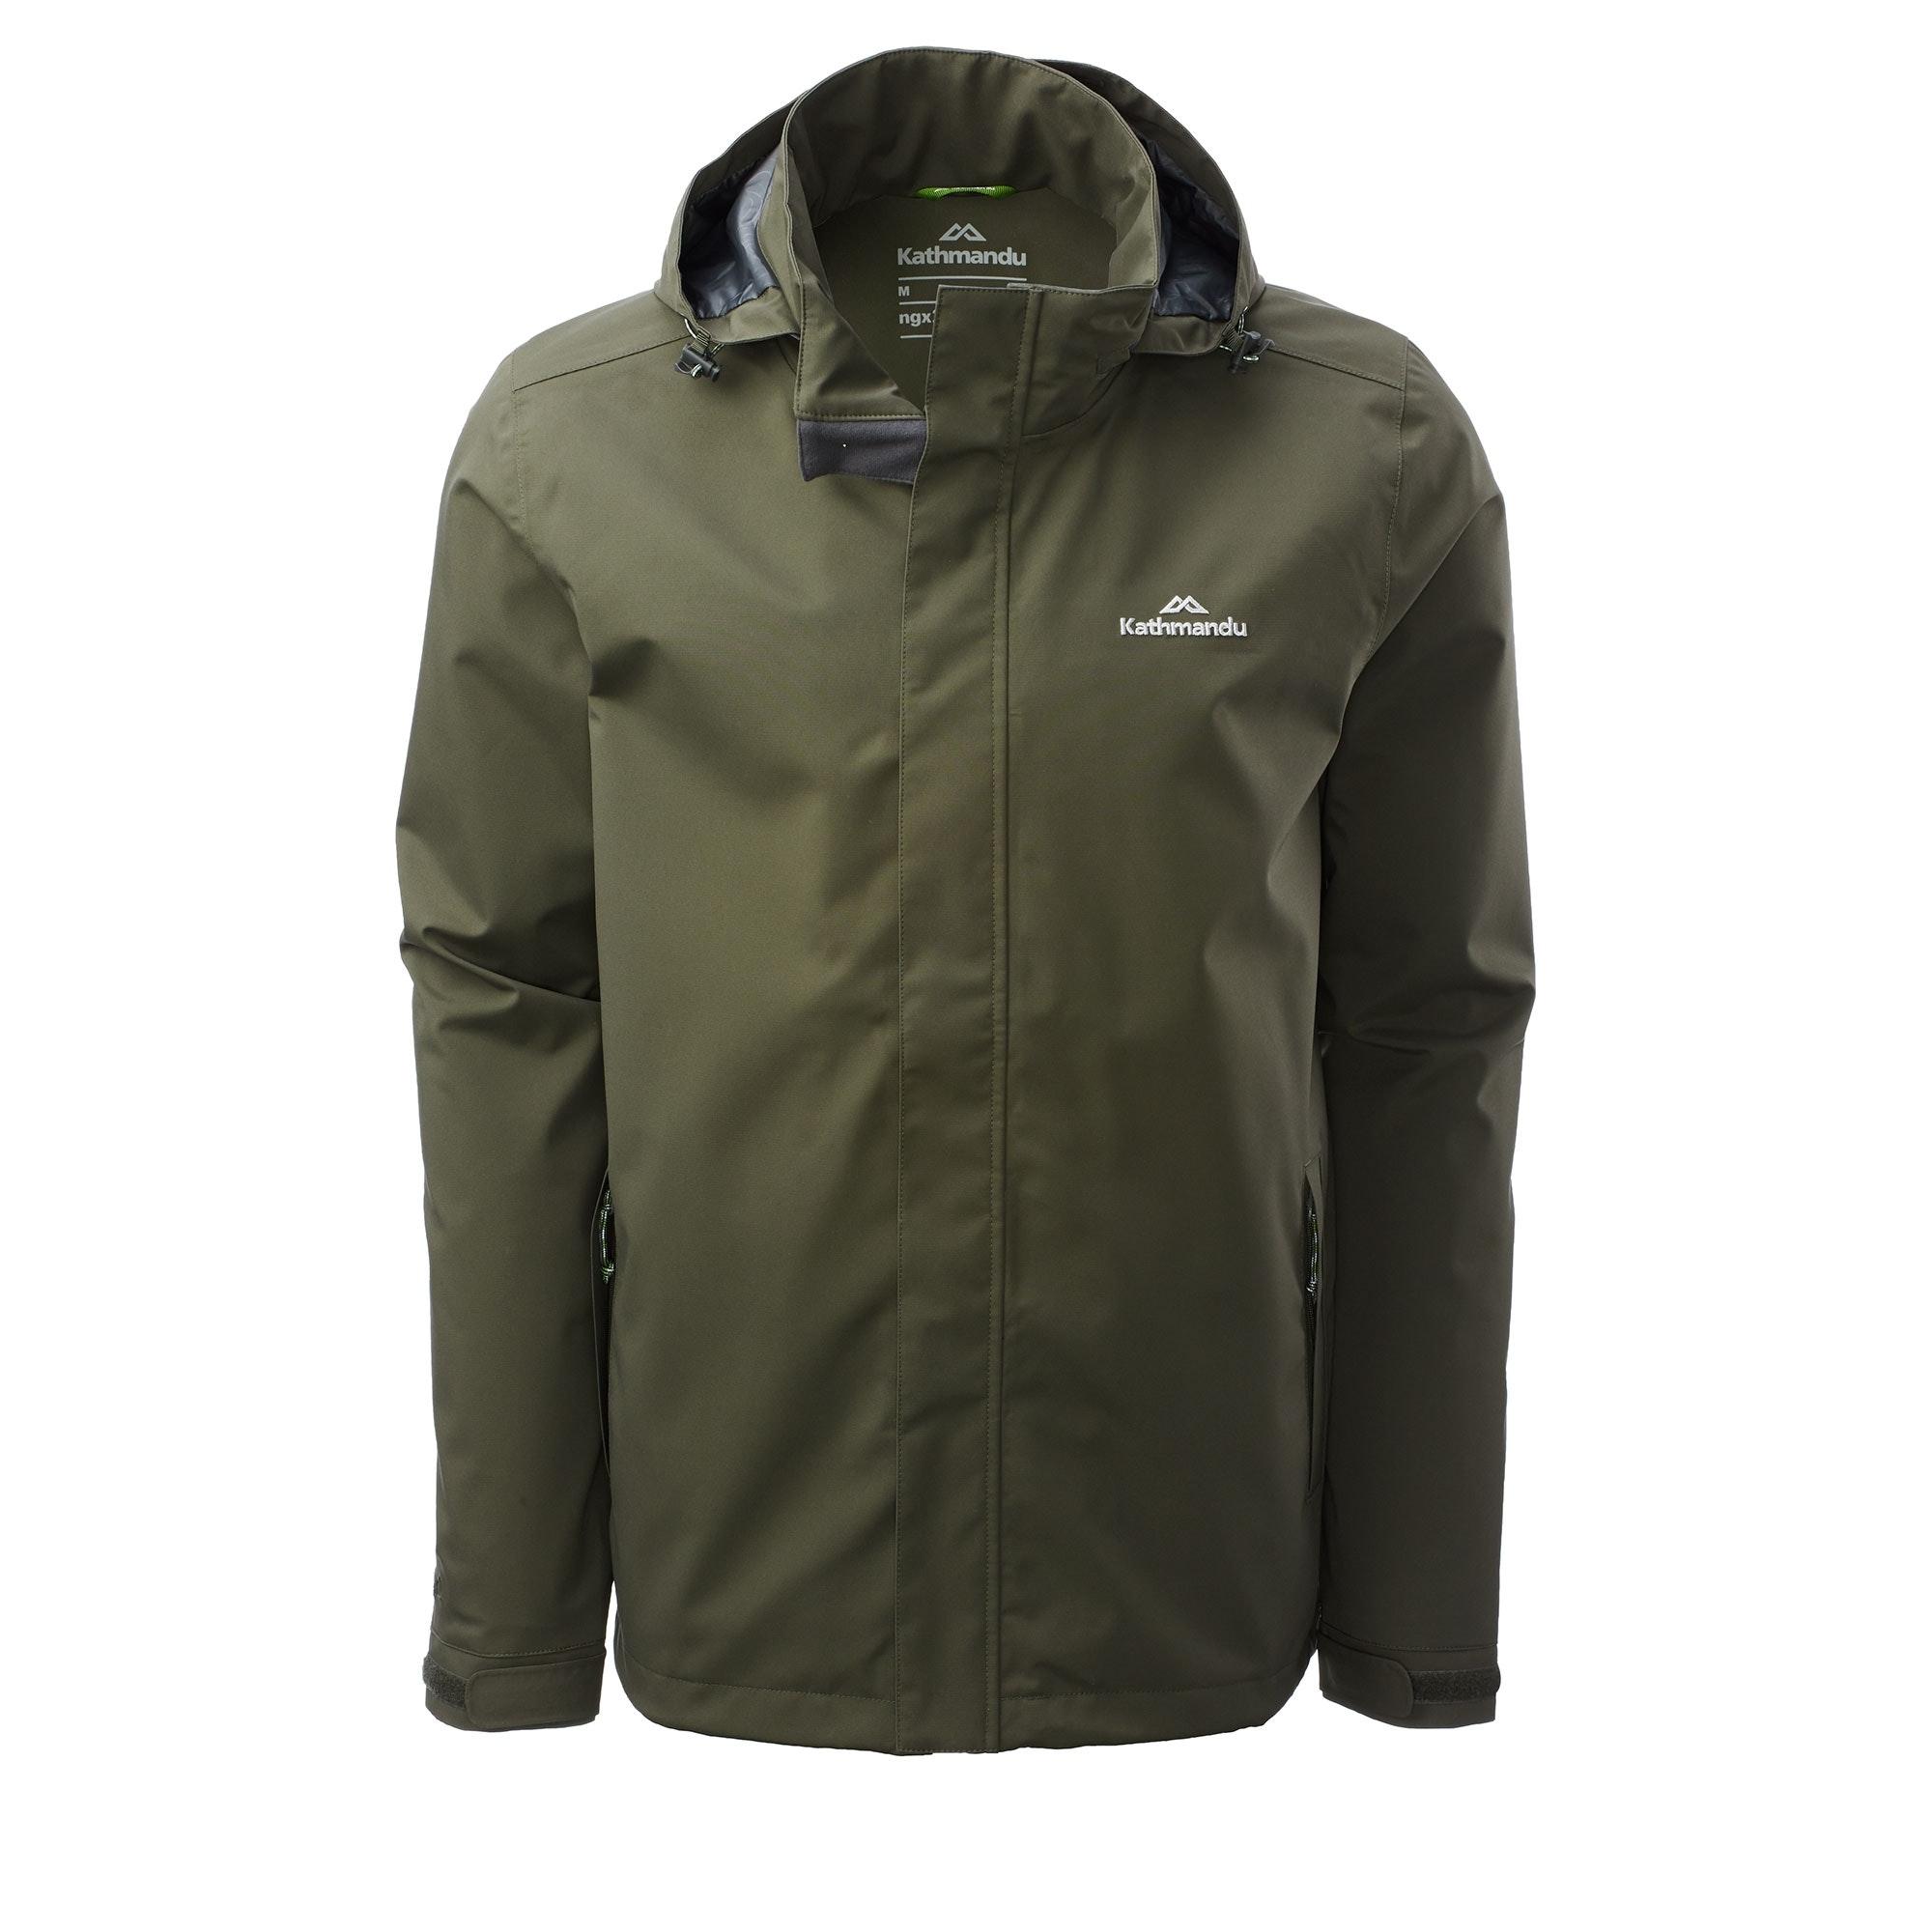 Kathmandu-Andulo-Men-039-s-2-Layer-Waterproof-Jacket